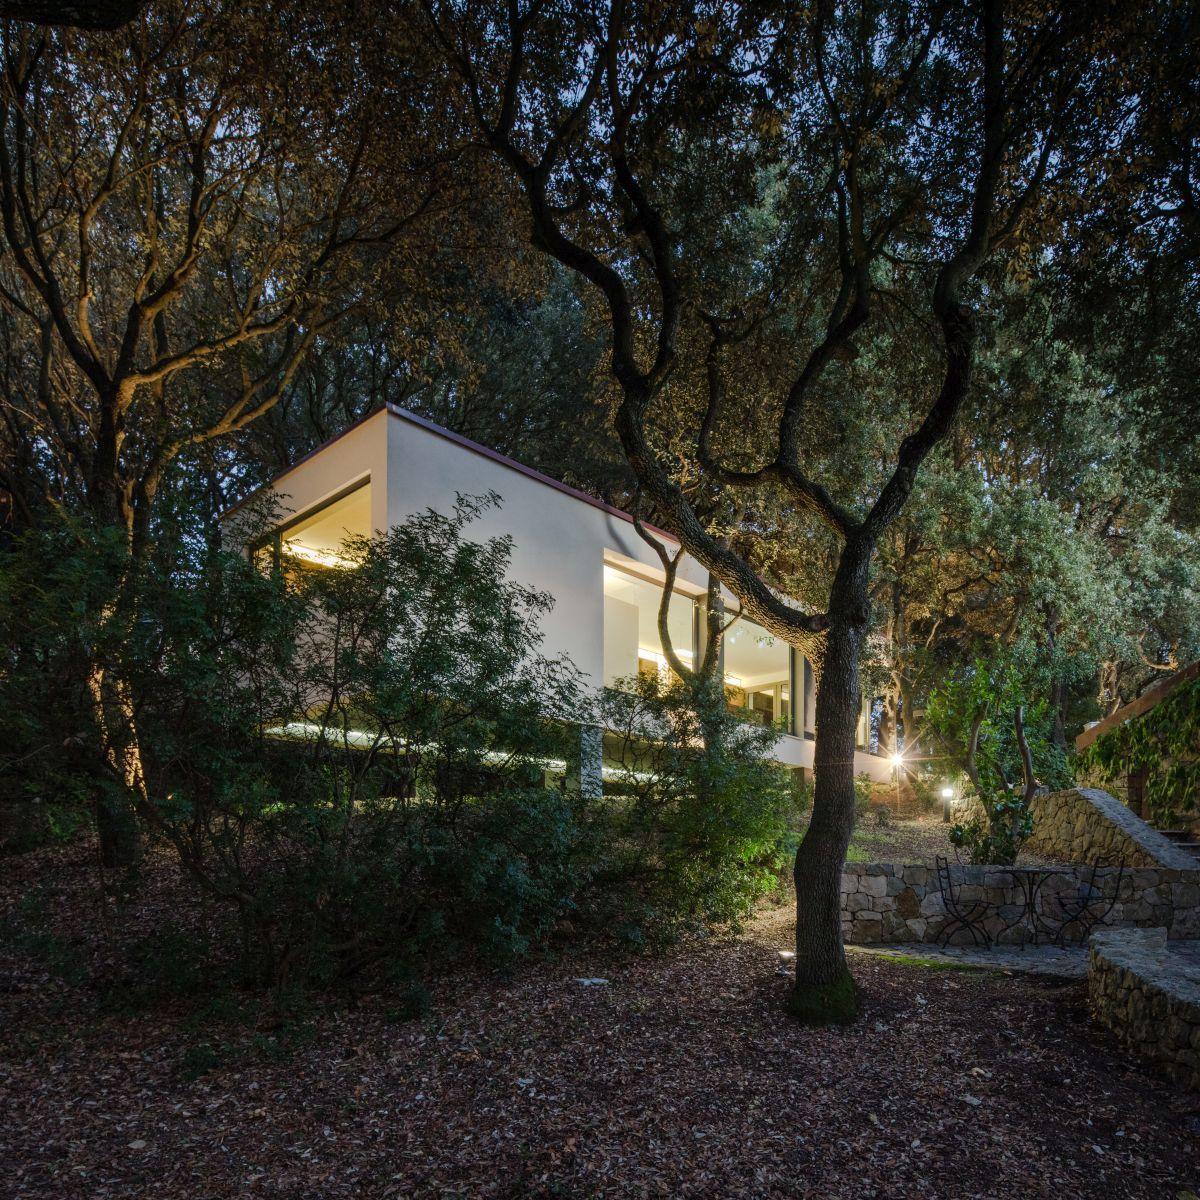 Casa nel Bosco surroundings at dawn